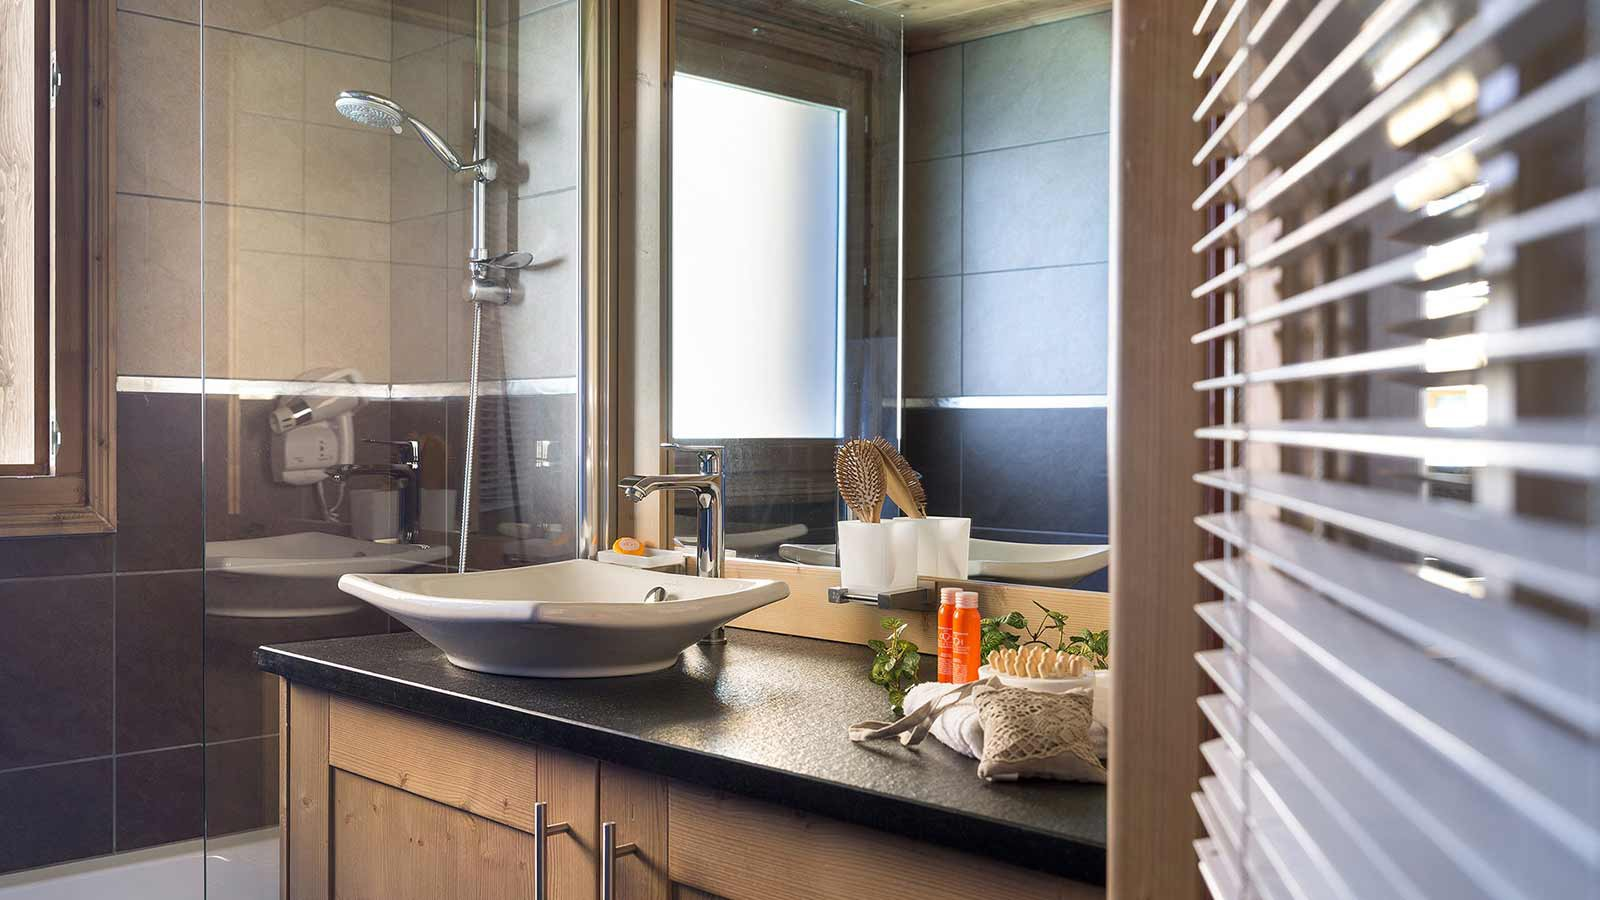 Bathroom, Le Lodge Hemera - Ski Apartments in La Rosiere, France